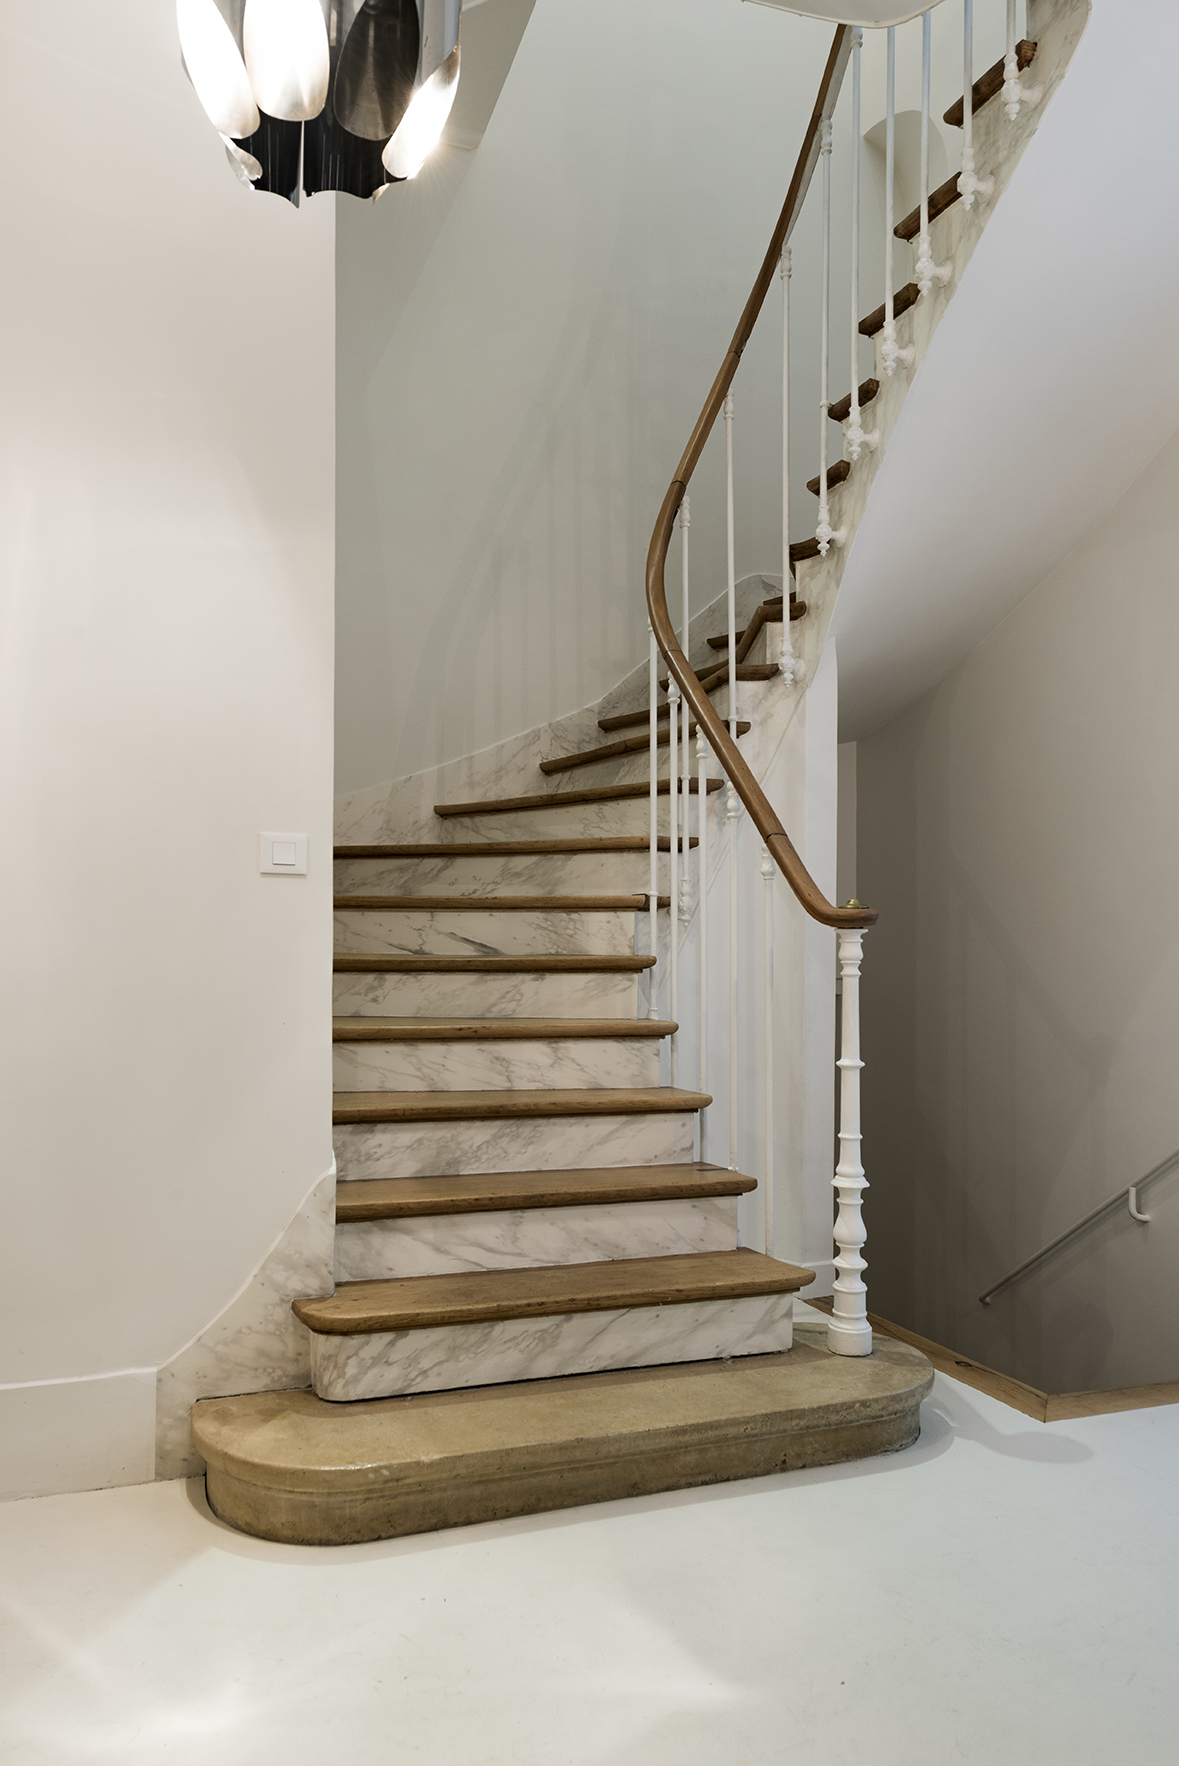 .... Vers l'étage inférieur… .. To the lower floor… ....